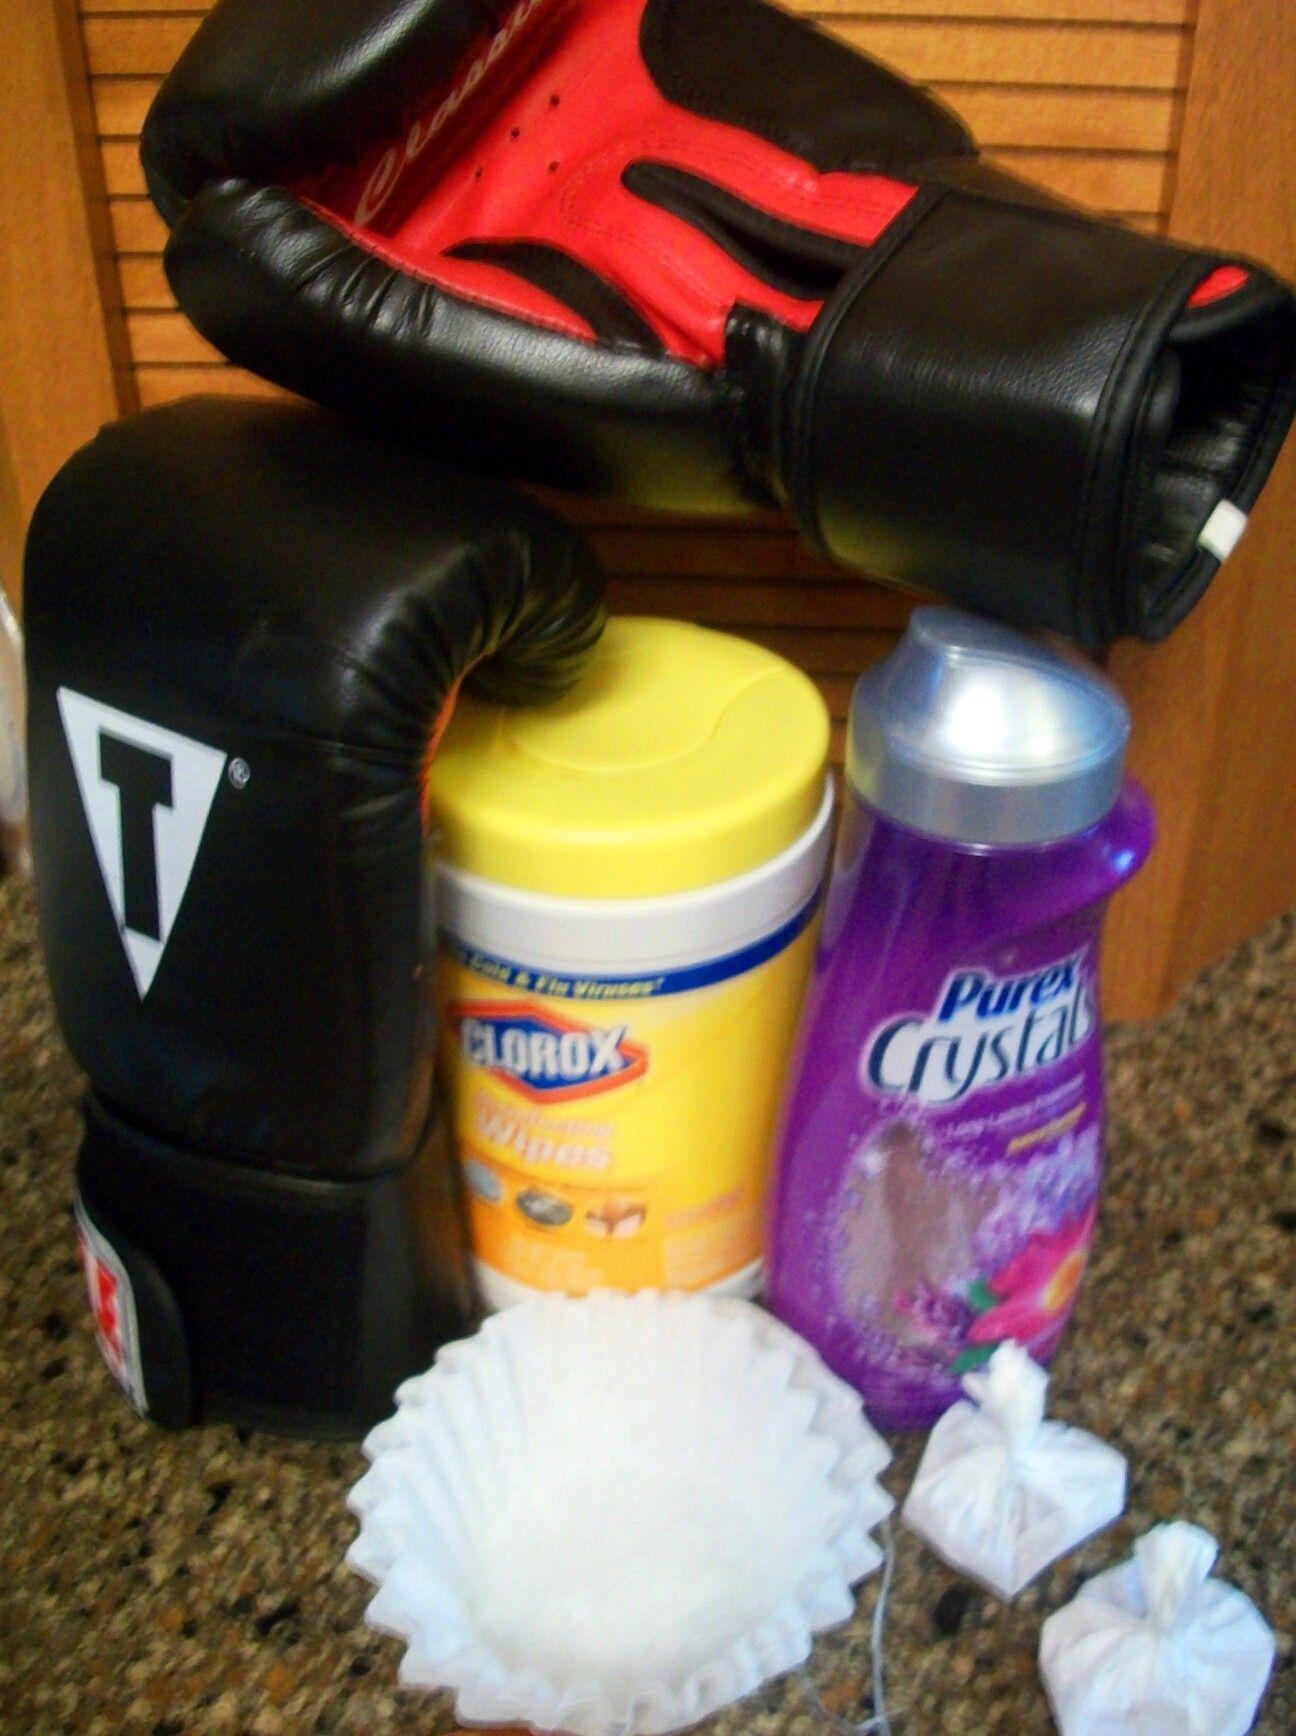 Pin By Yolanda Maria On Things I Love Kickboxing Workout Home Boxing Workout I Love Kickboxing